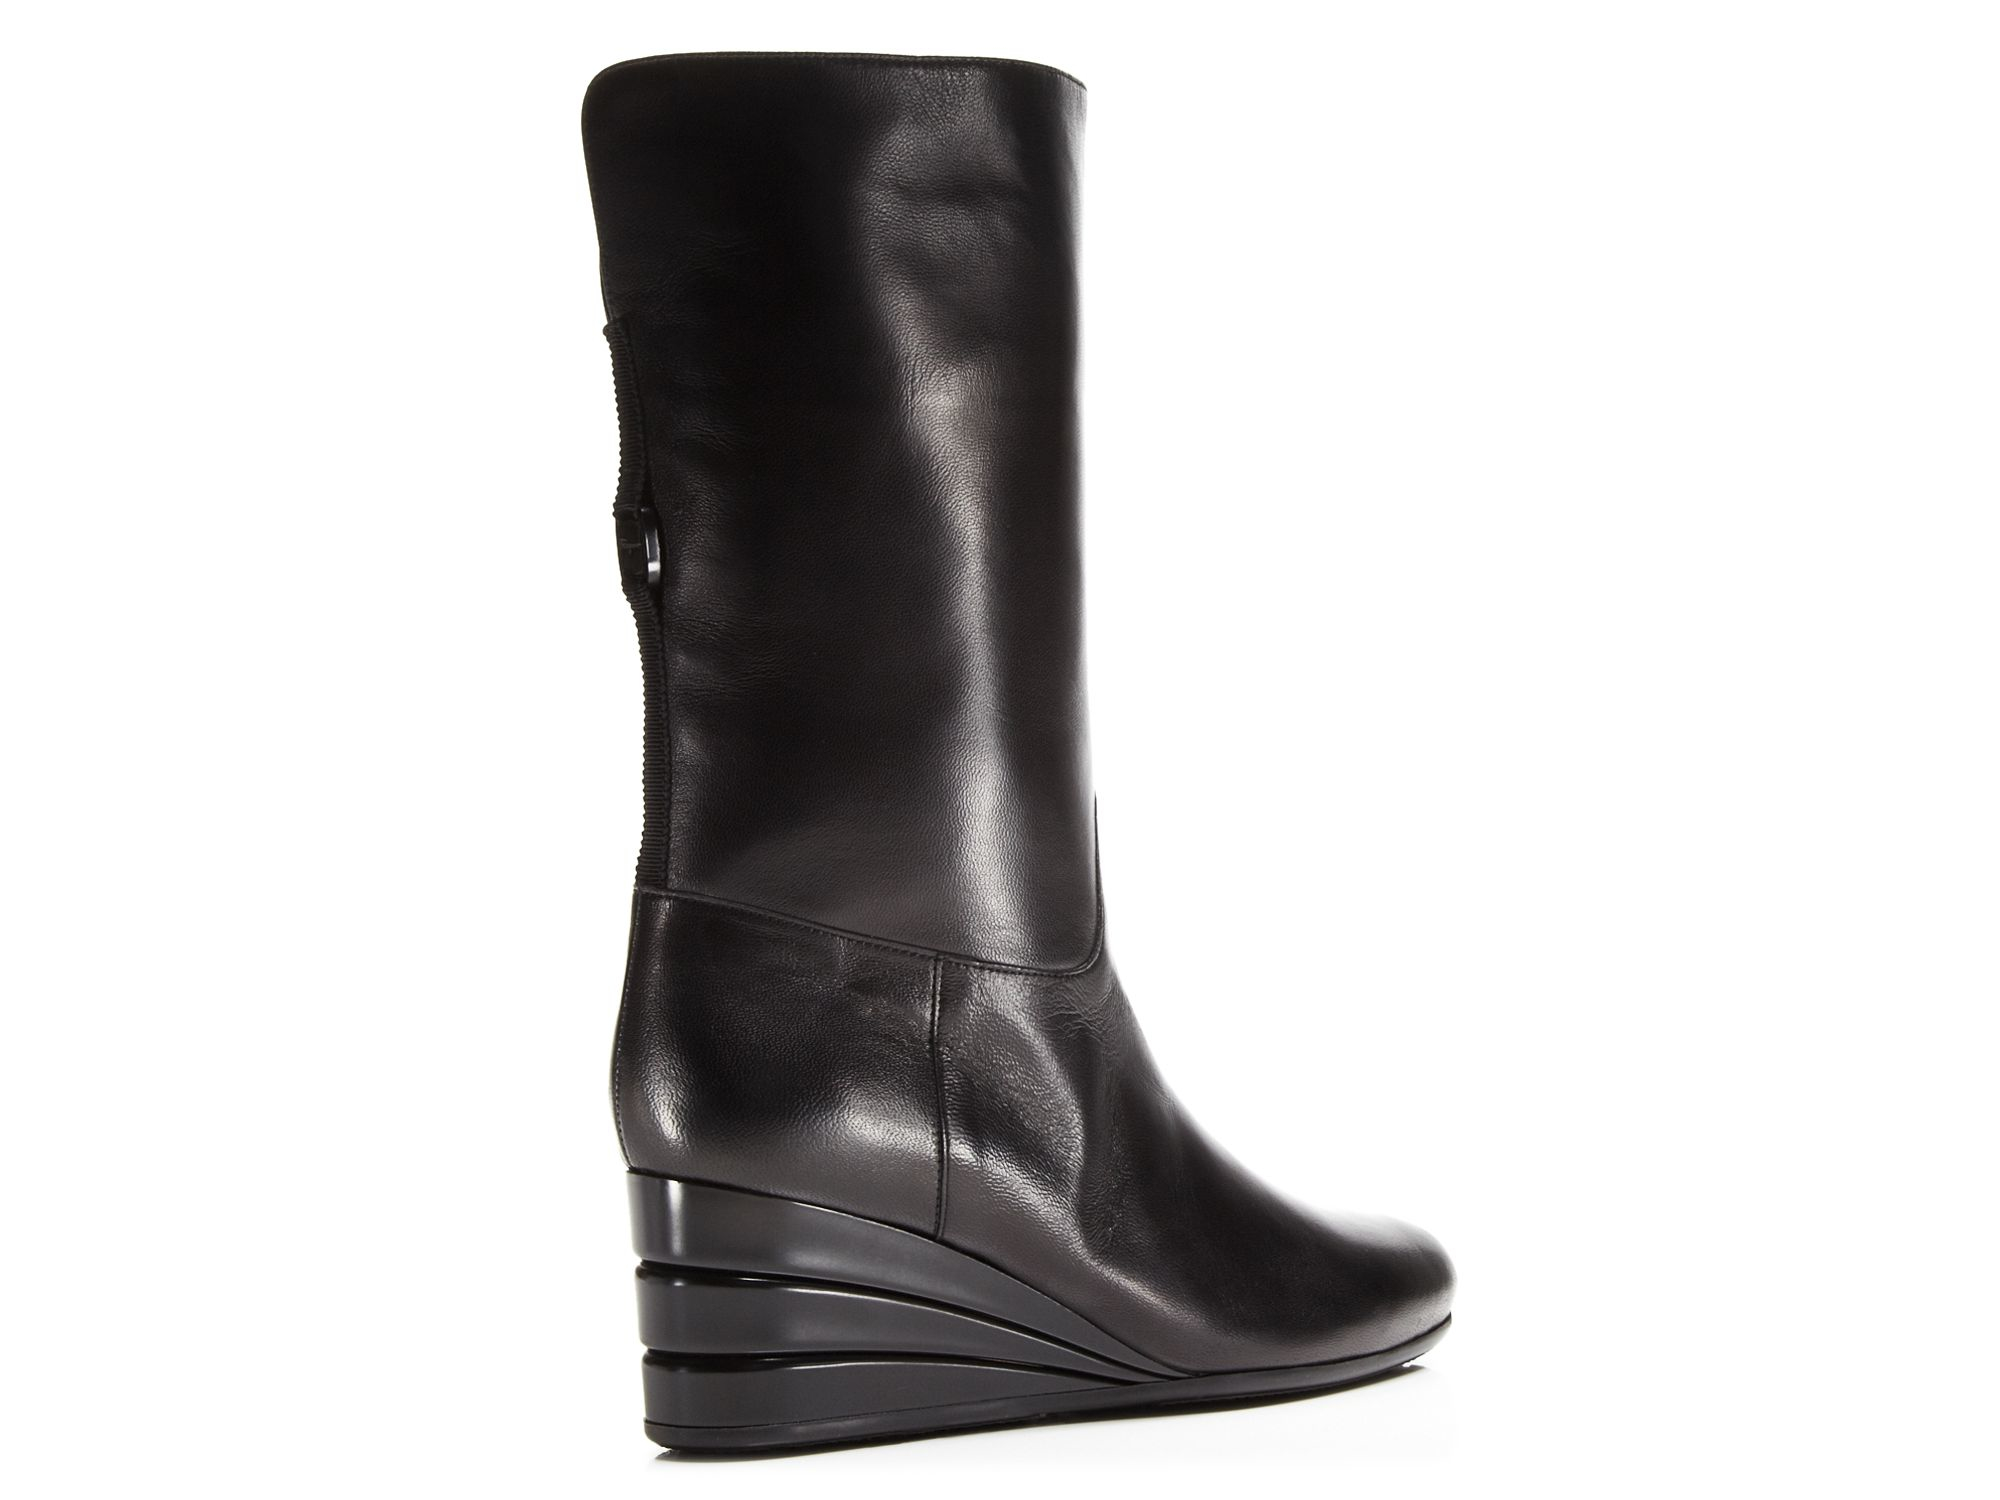 ferragamo my winter leather wedge boots in black lyst